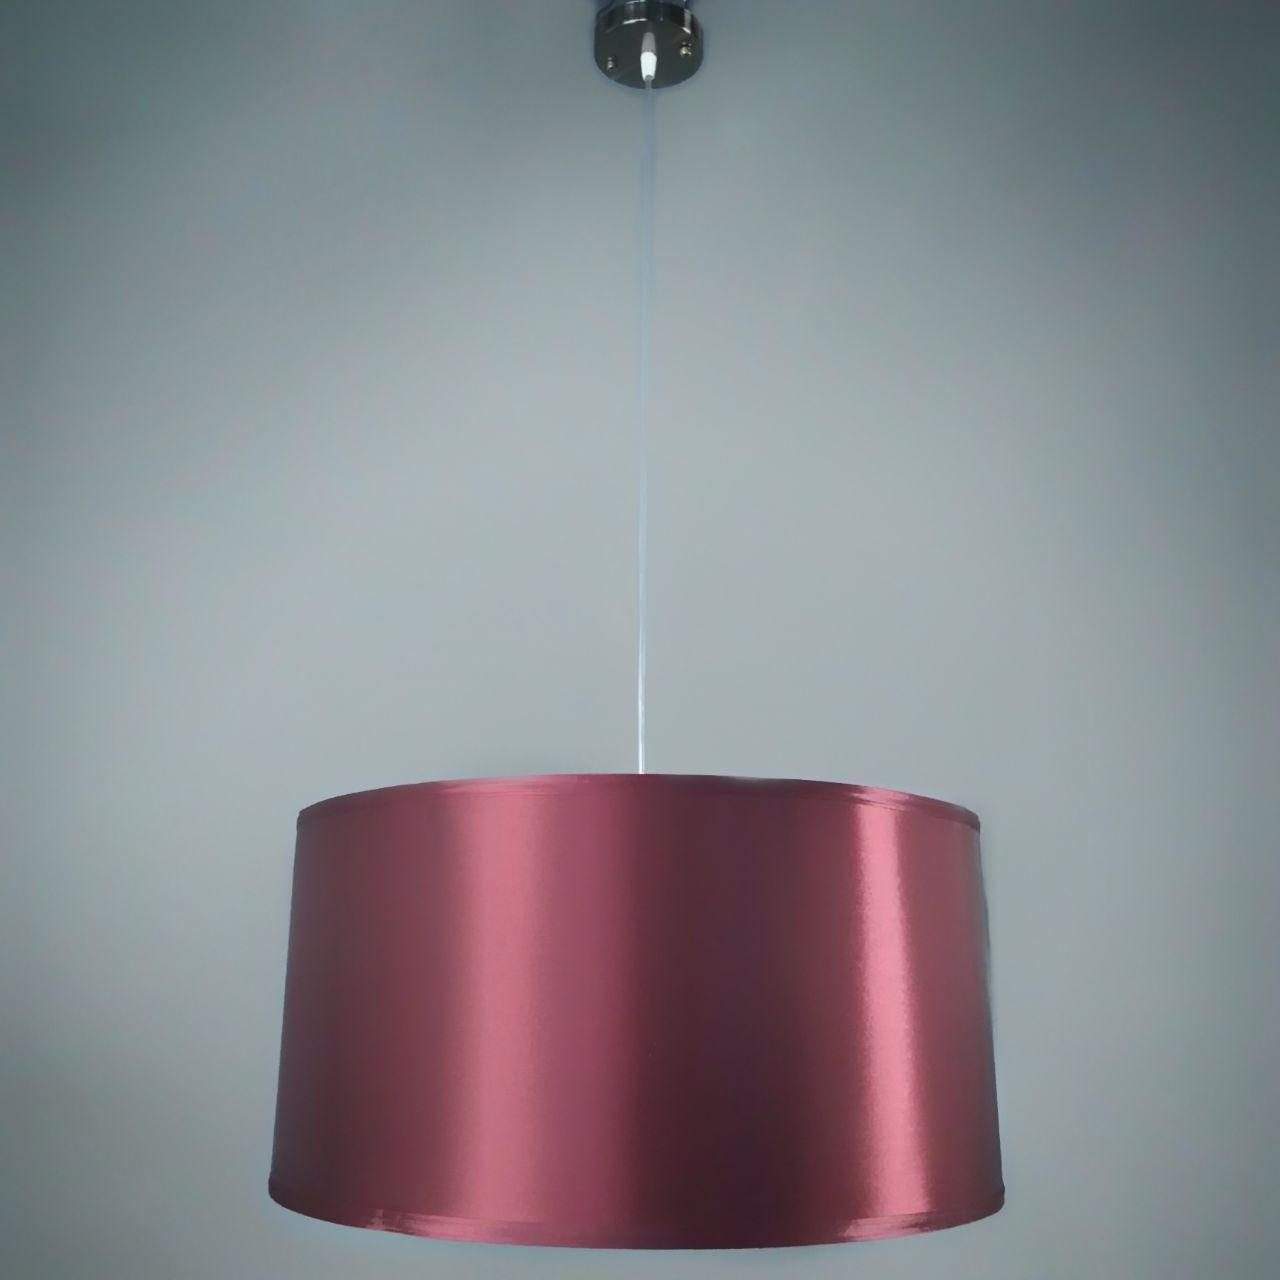 Люстра подвесная на 1 лампу P4505 Бордо (50см)TK